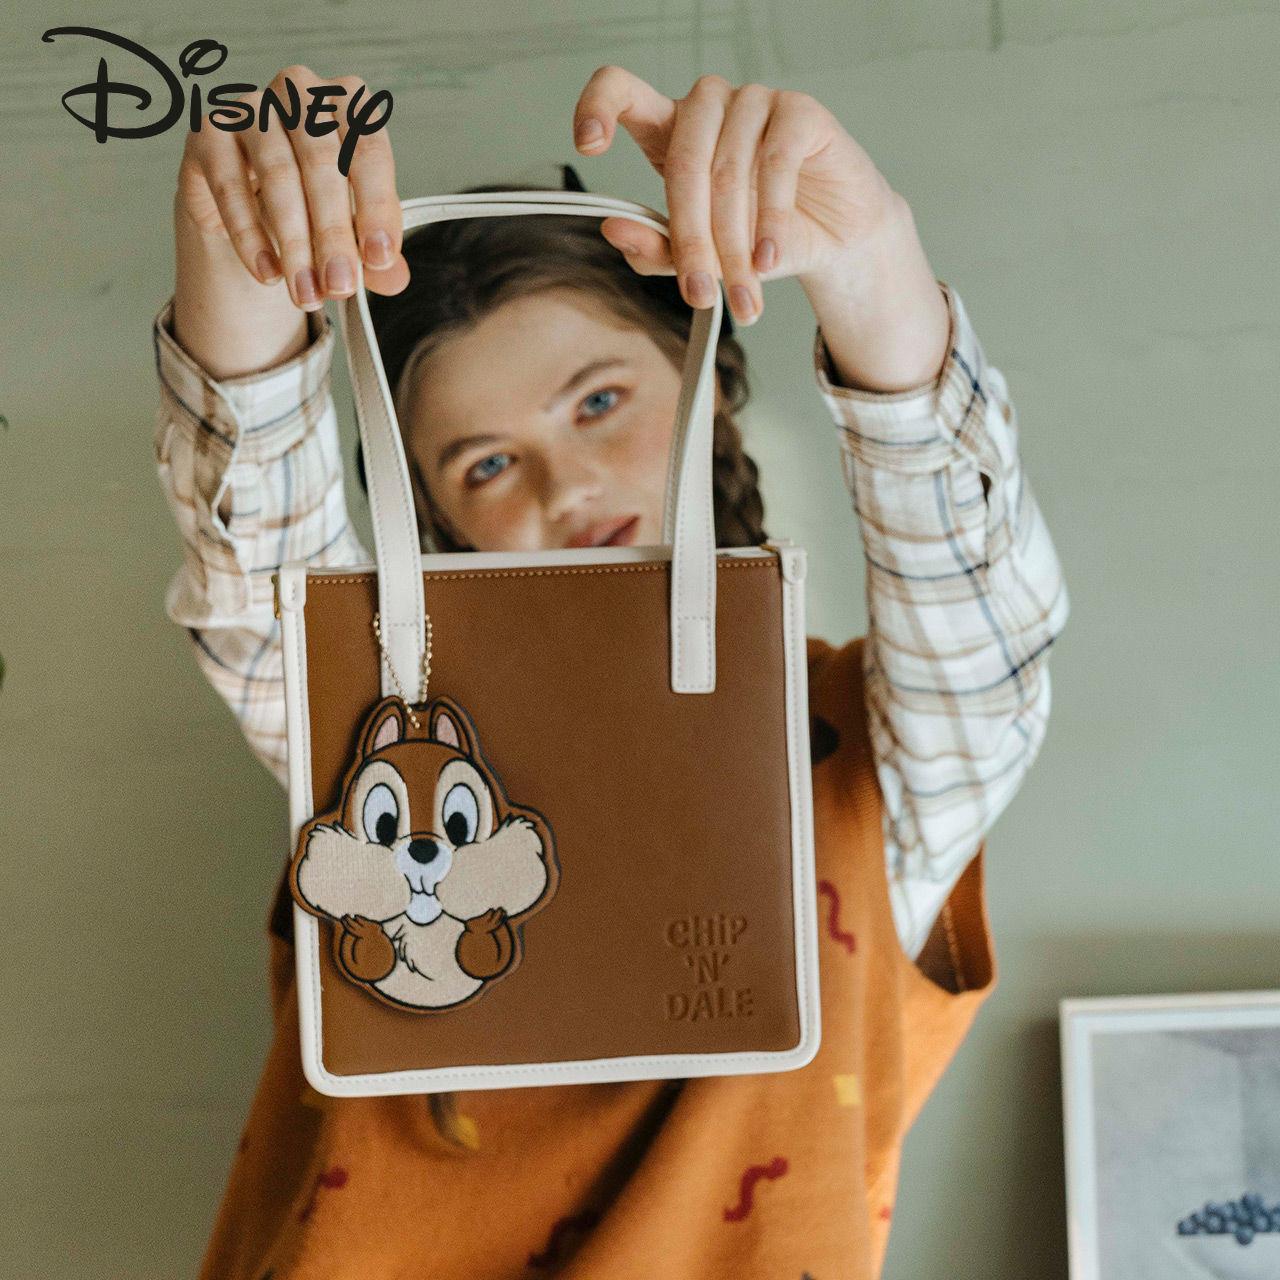 Disney New Cartoon Lady Handbag Large Capacity Fashion Casual High Quality Luxury Multifunctional Lady Shoulder Messenger Bag